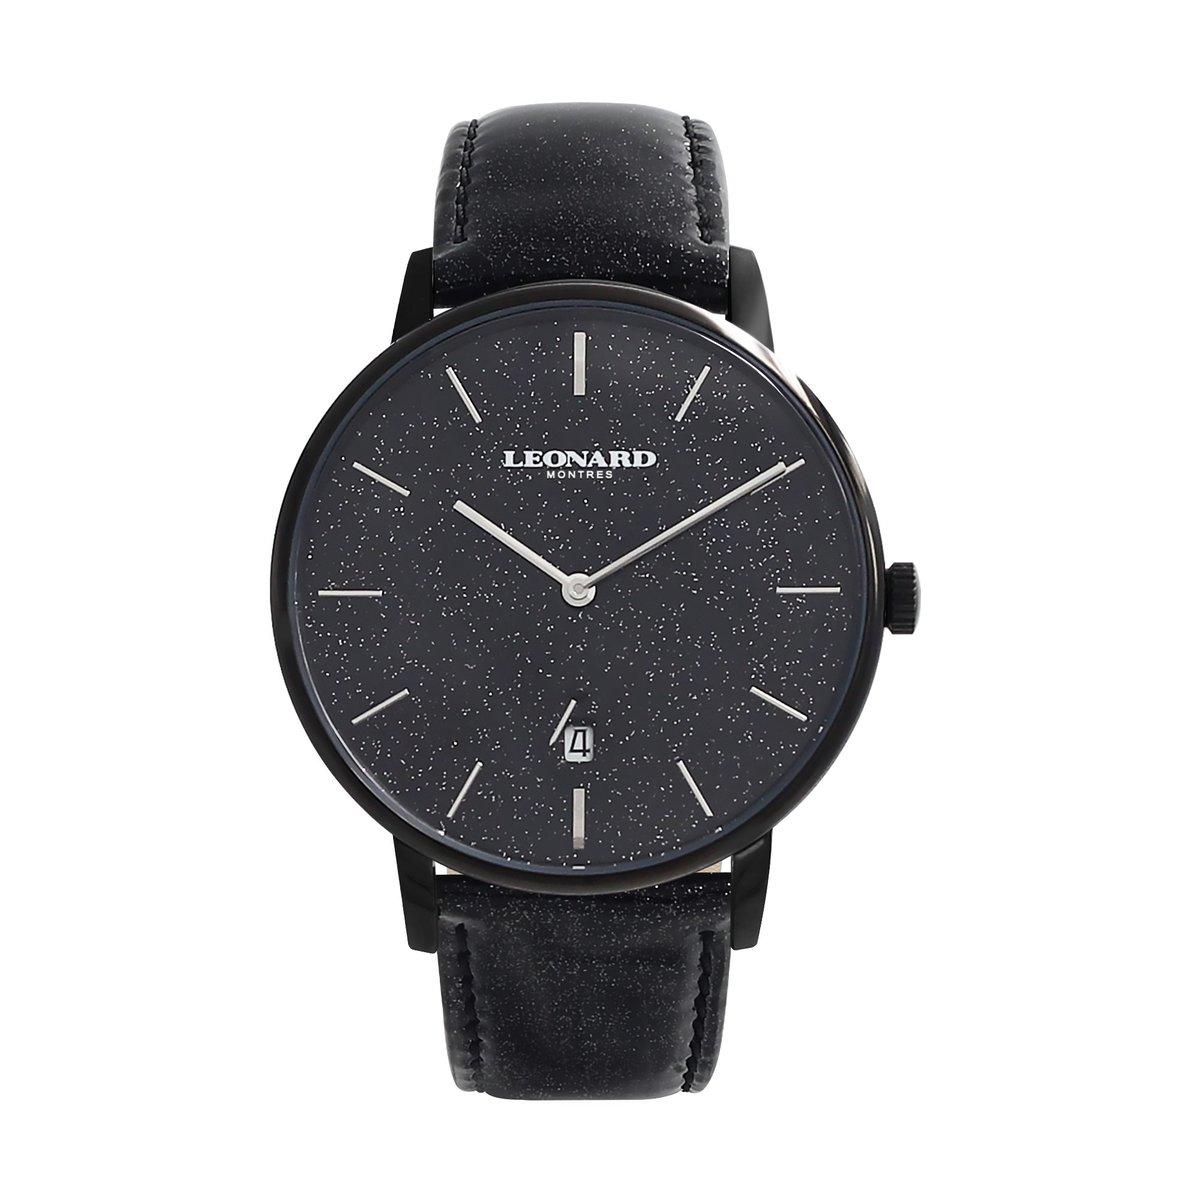 La mode Circular Watches LGC1008-22B